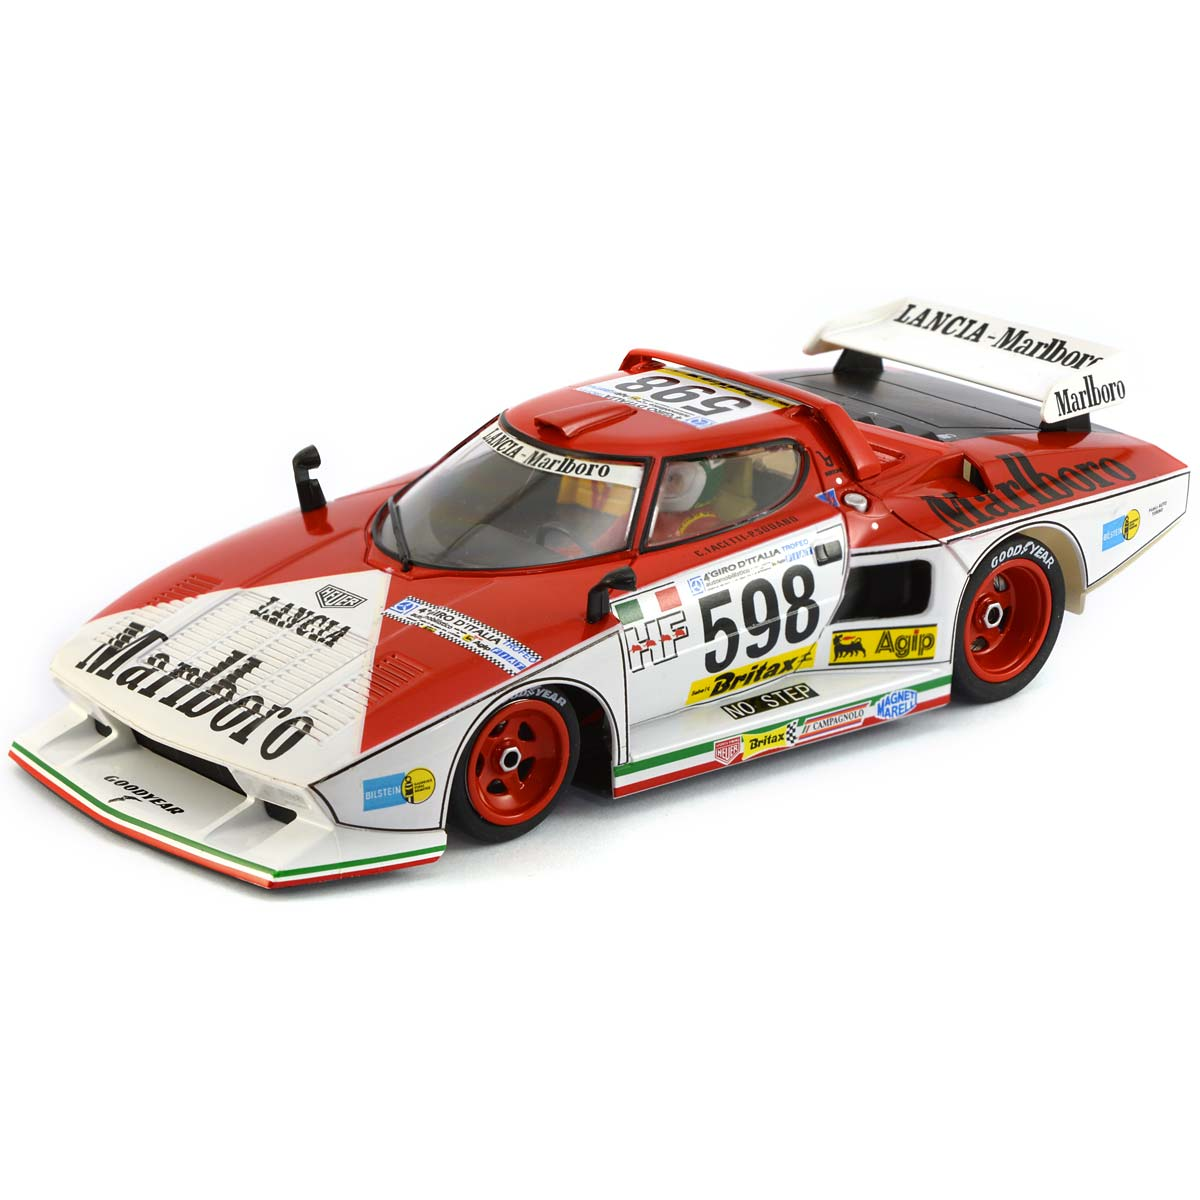 1200x1200 Racer Sideways Lancia Stratos Turbo Silhouette (Sw52)